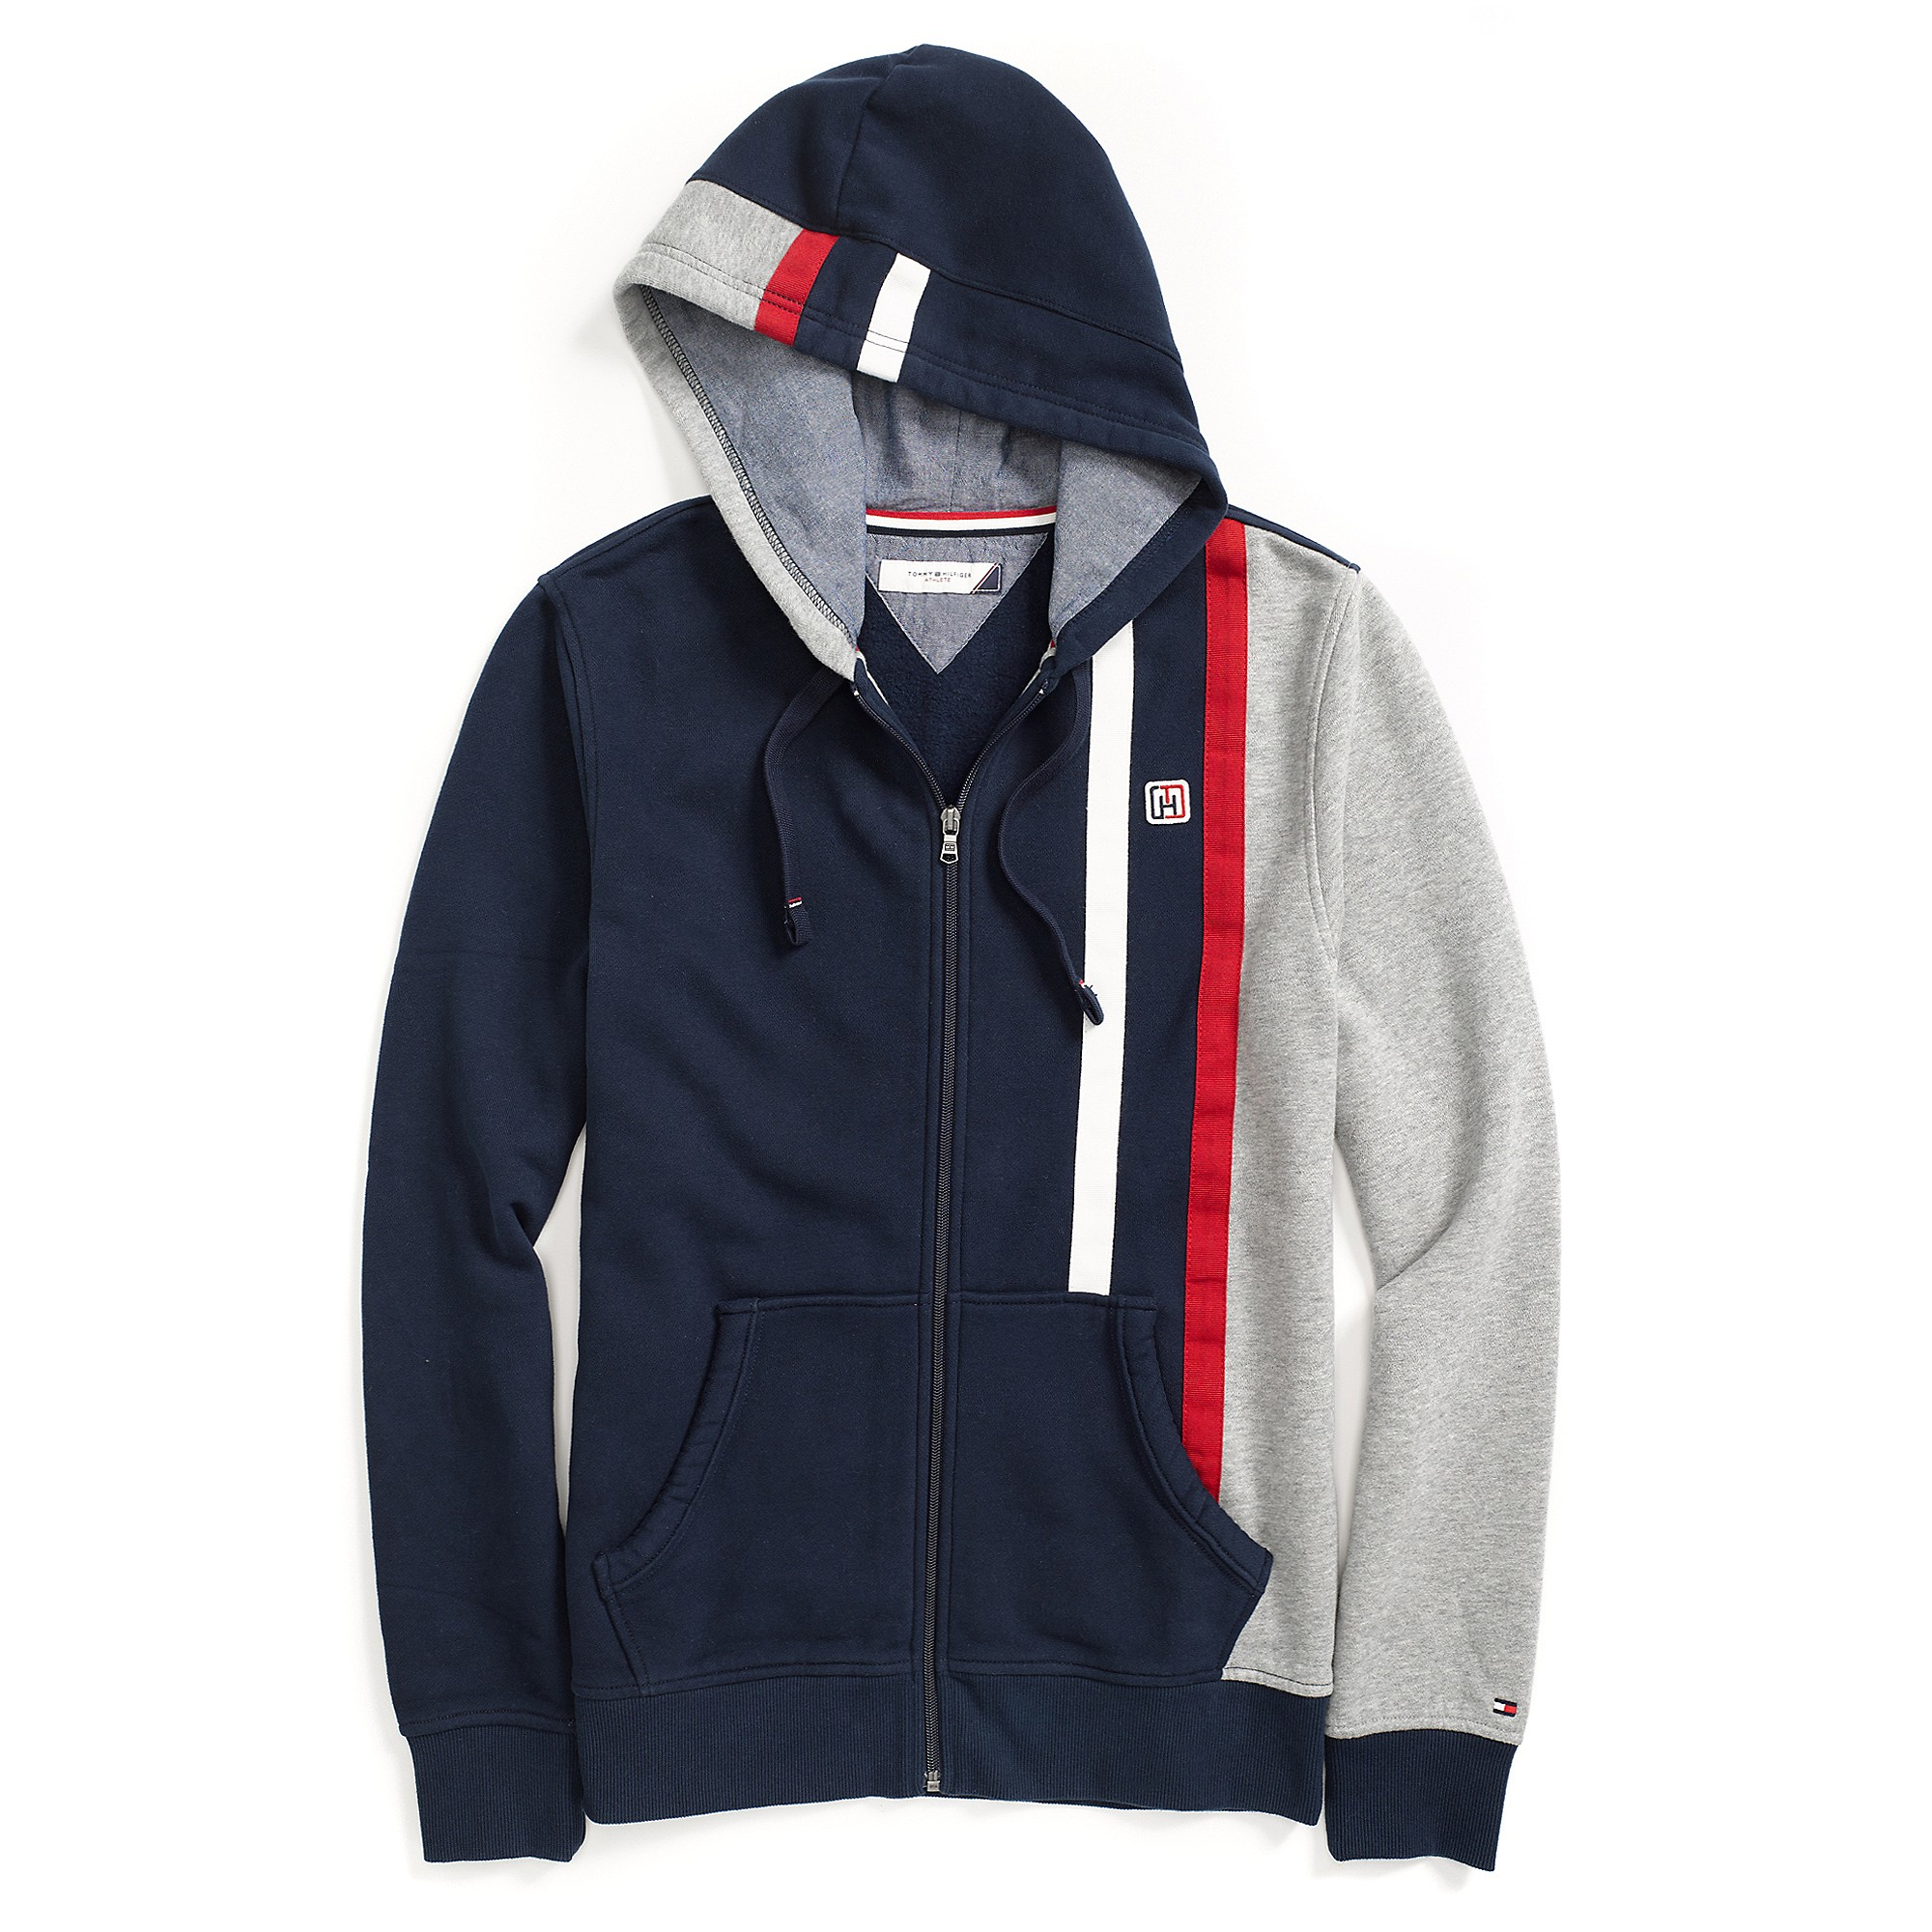 tommy hilfiger full zip hoodie in blue for men core navy. Black Bedroom Furniture Sets. Home Design Ideas